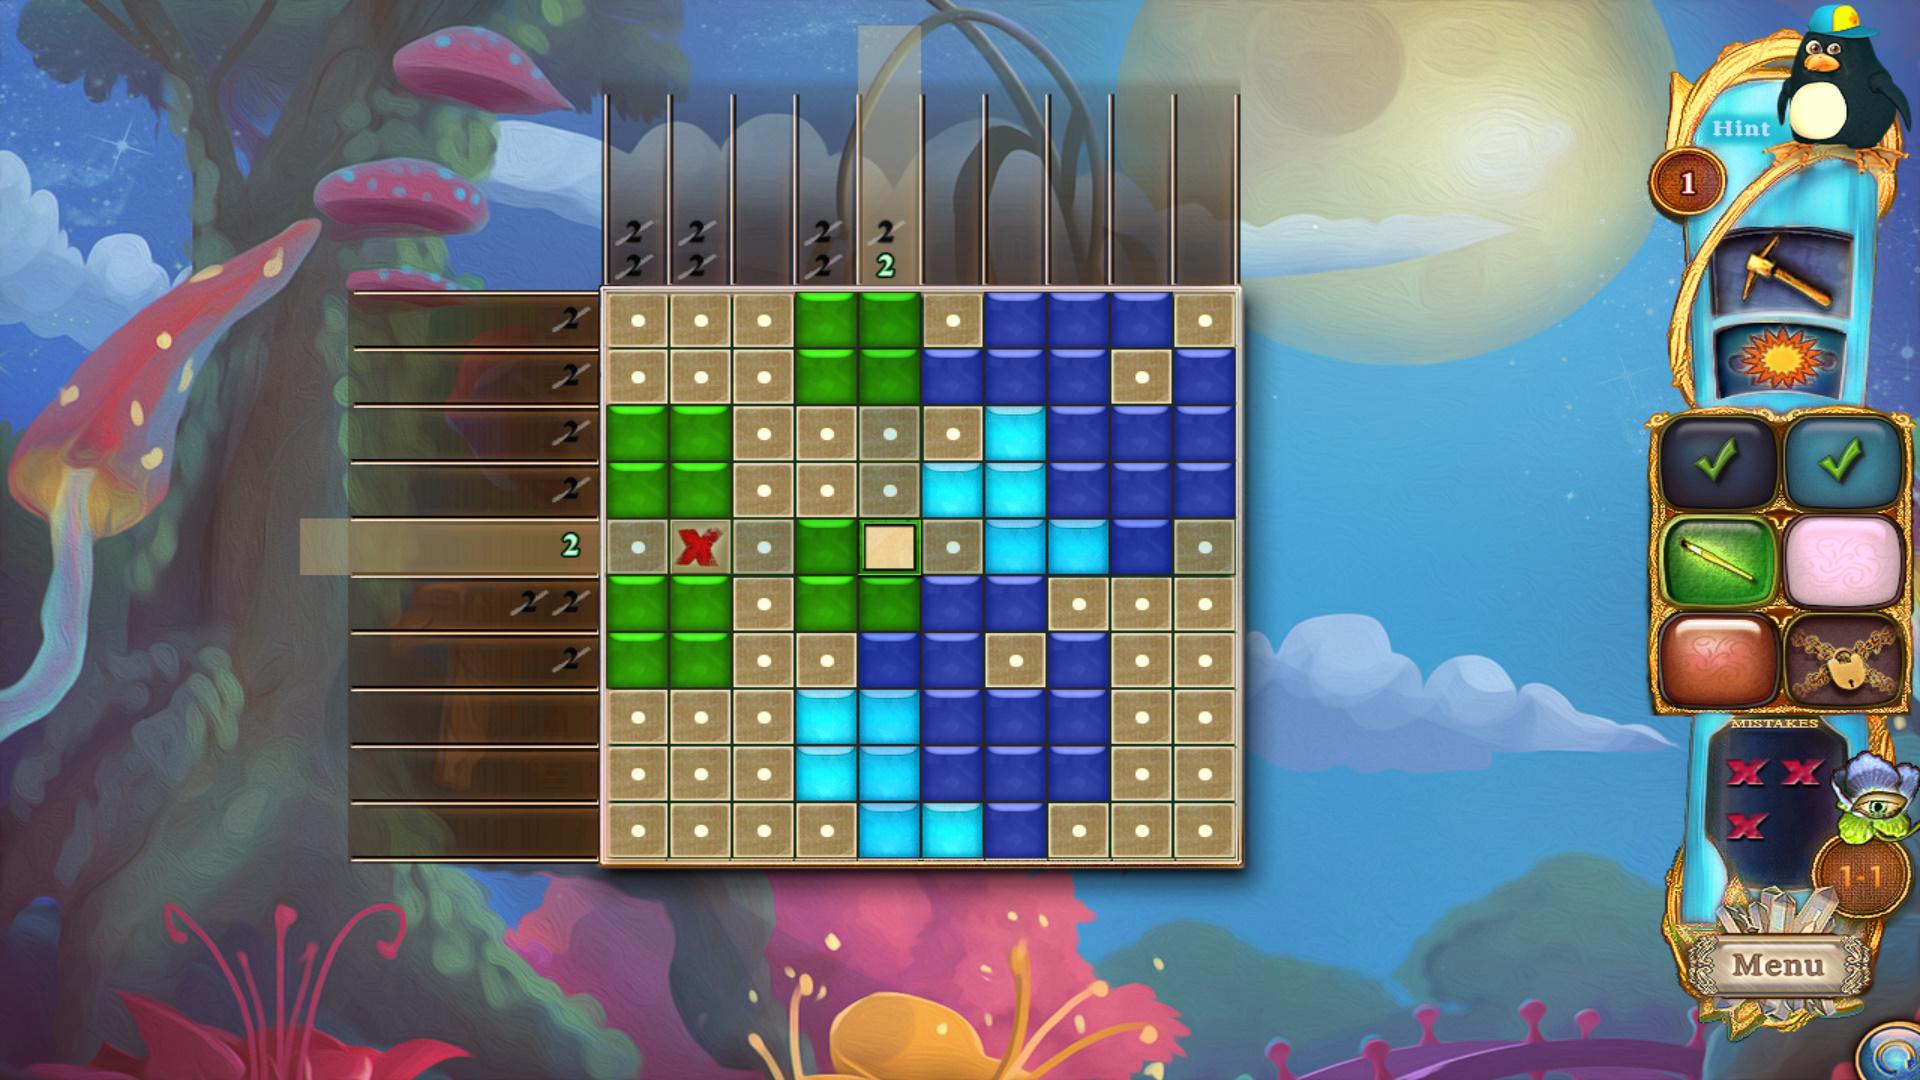 Immortal Fantasy Mosaics 31: First Date (2018/PC/Английский), Unofficial